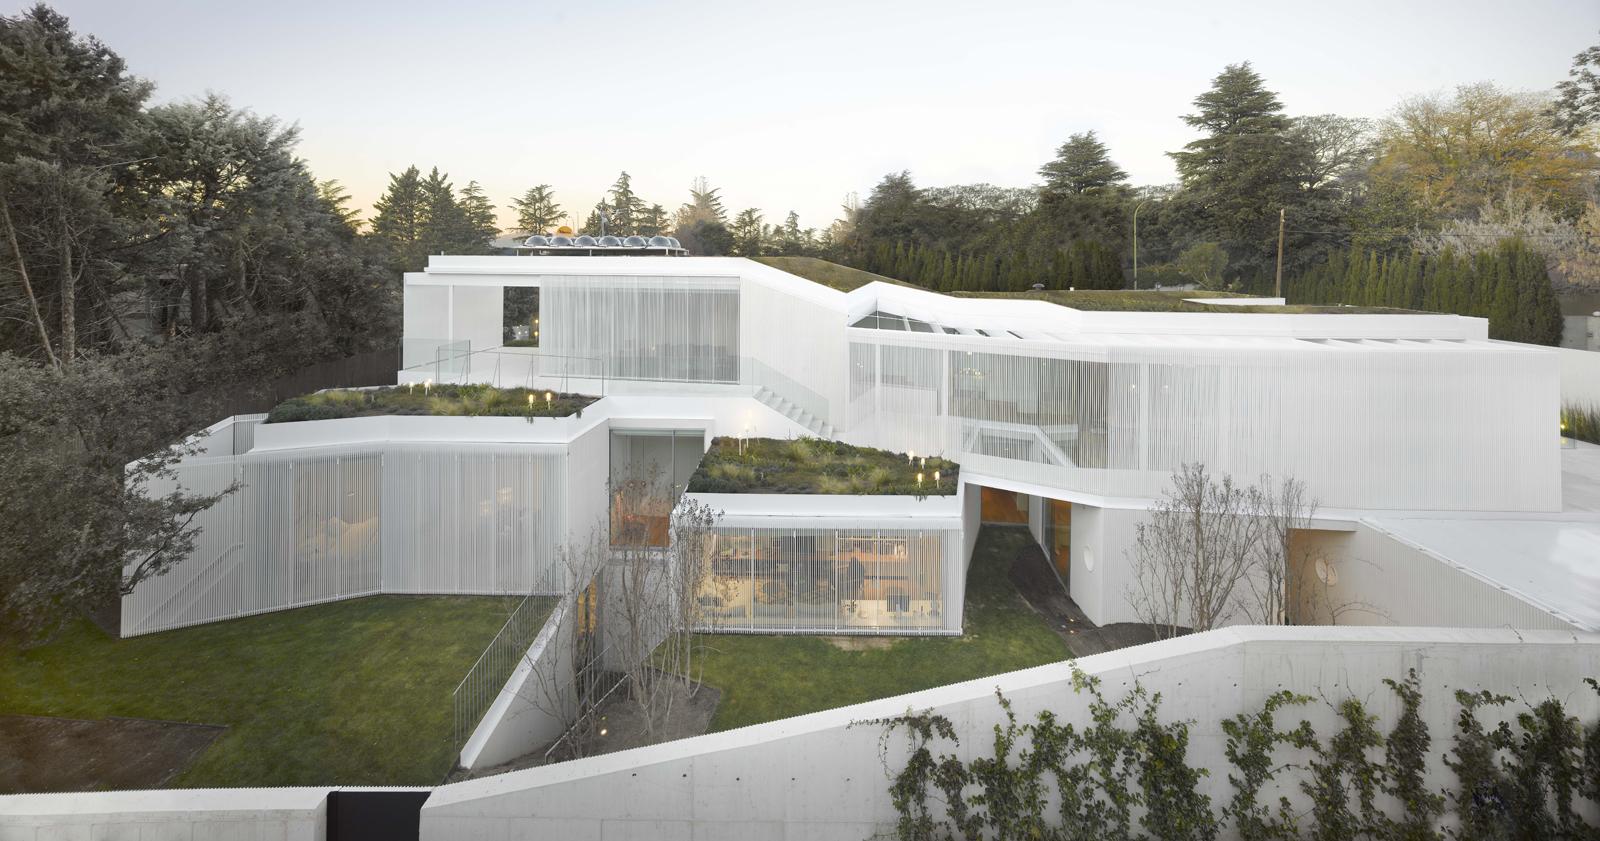 Estudio entresitio casa 1130 madrid hic arquitectura for Estudios arquitectura madrid